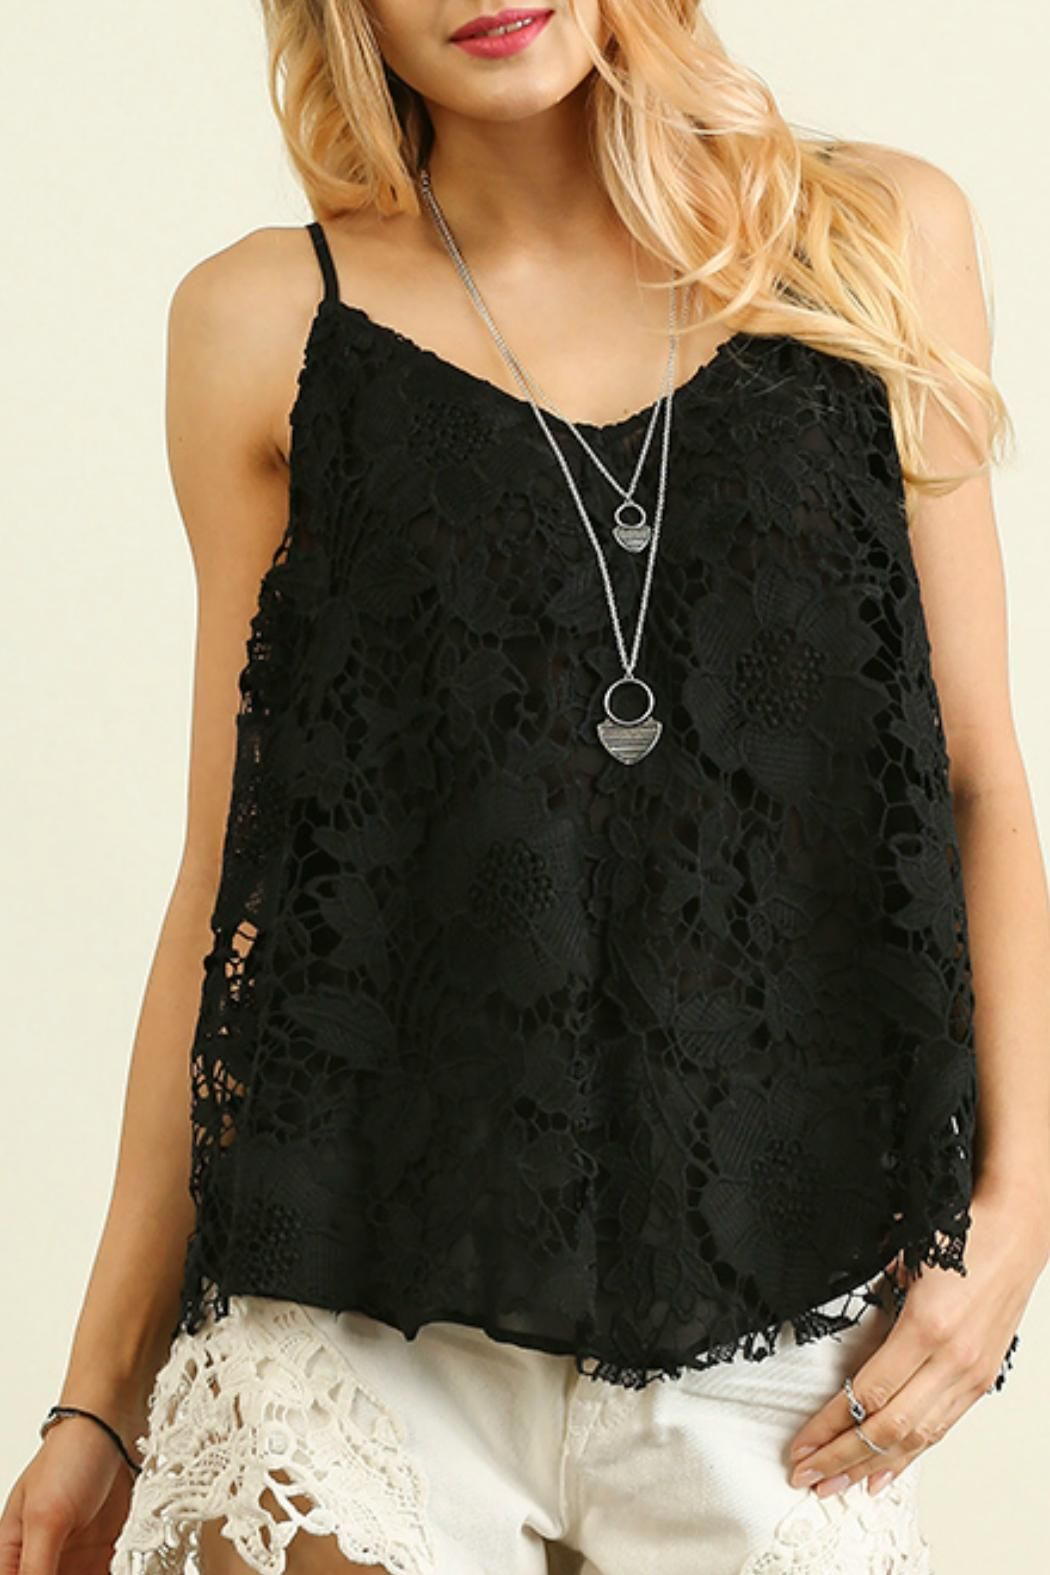 Umgee Usa Crochet Knit Top Shoptiques Boutique Products